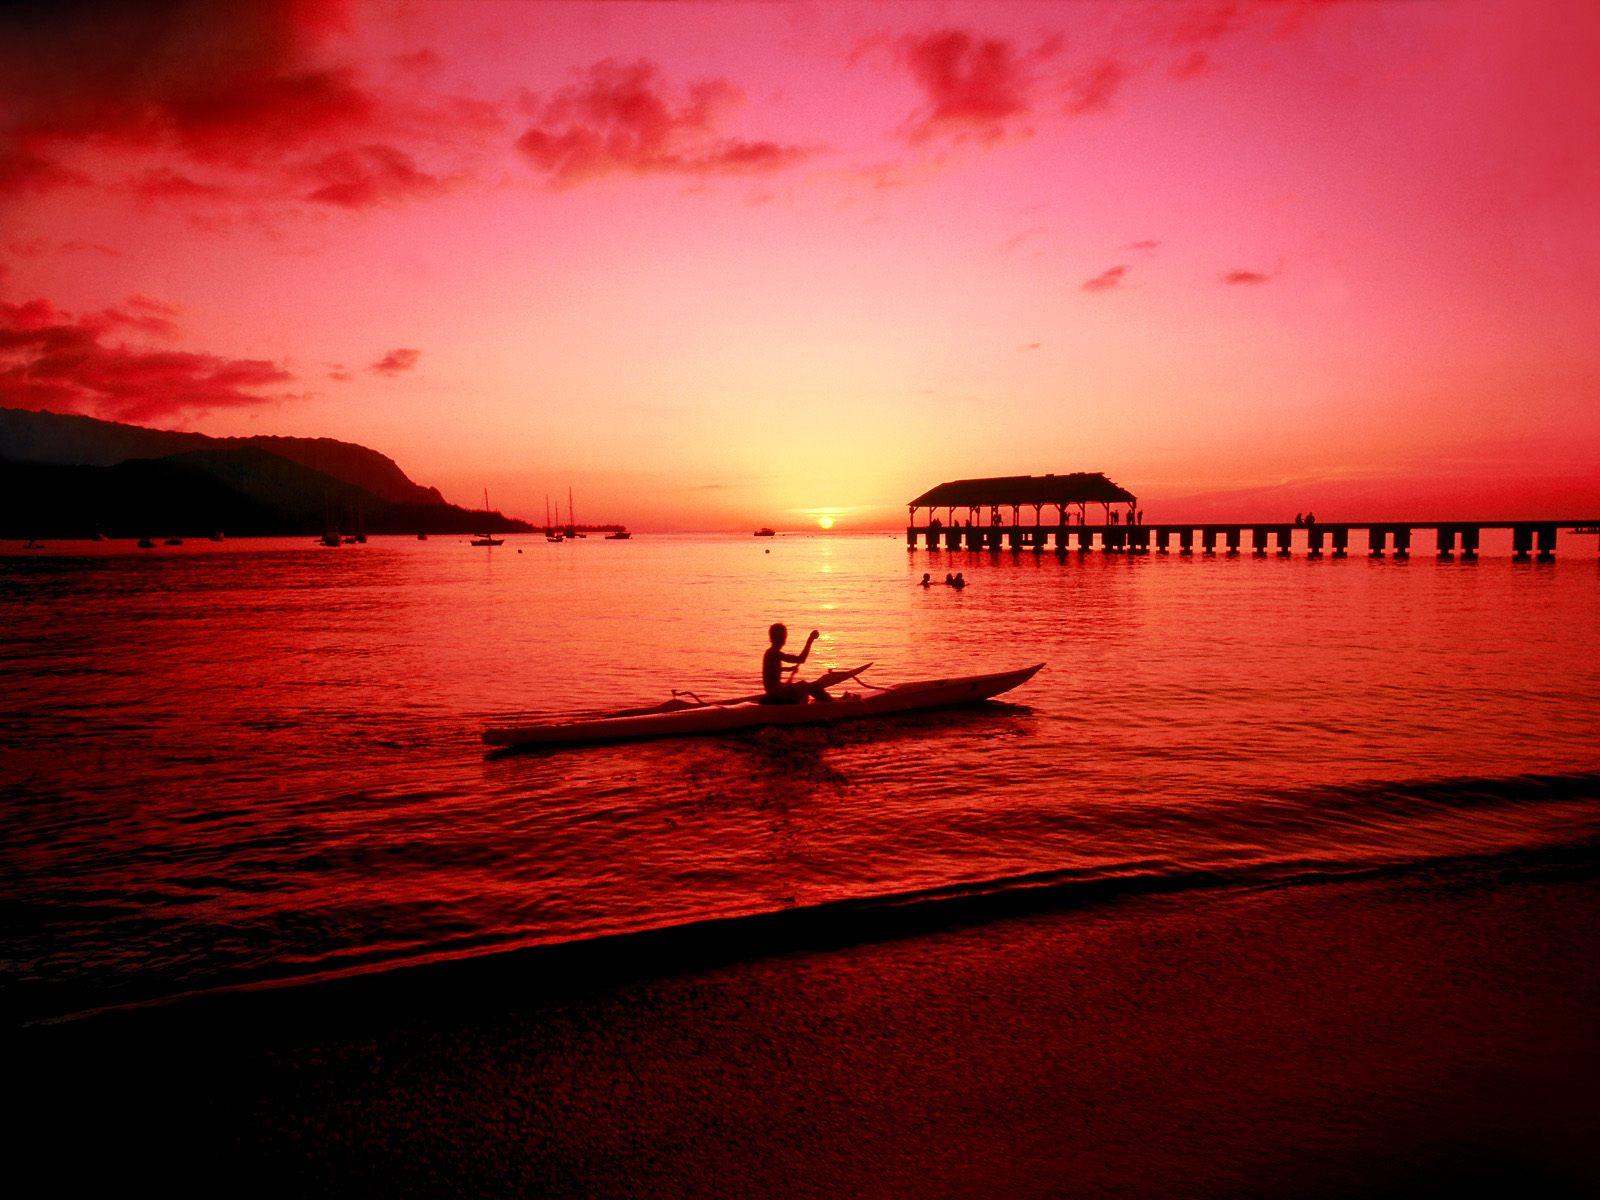 Hd Tropical Island Beach Paradise Wallpapers And Backgrounds: FULL WALLPAPER: Tropical Island Sunset Wallpaper